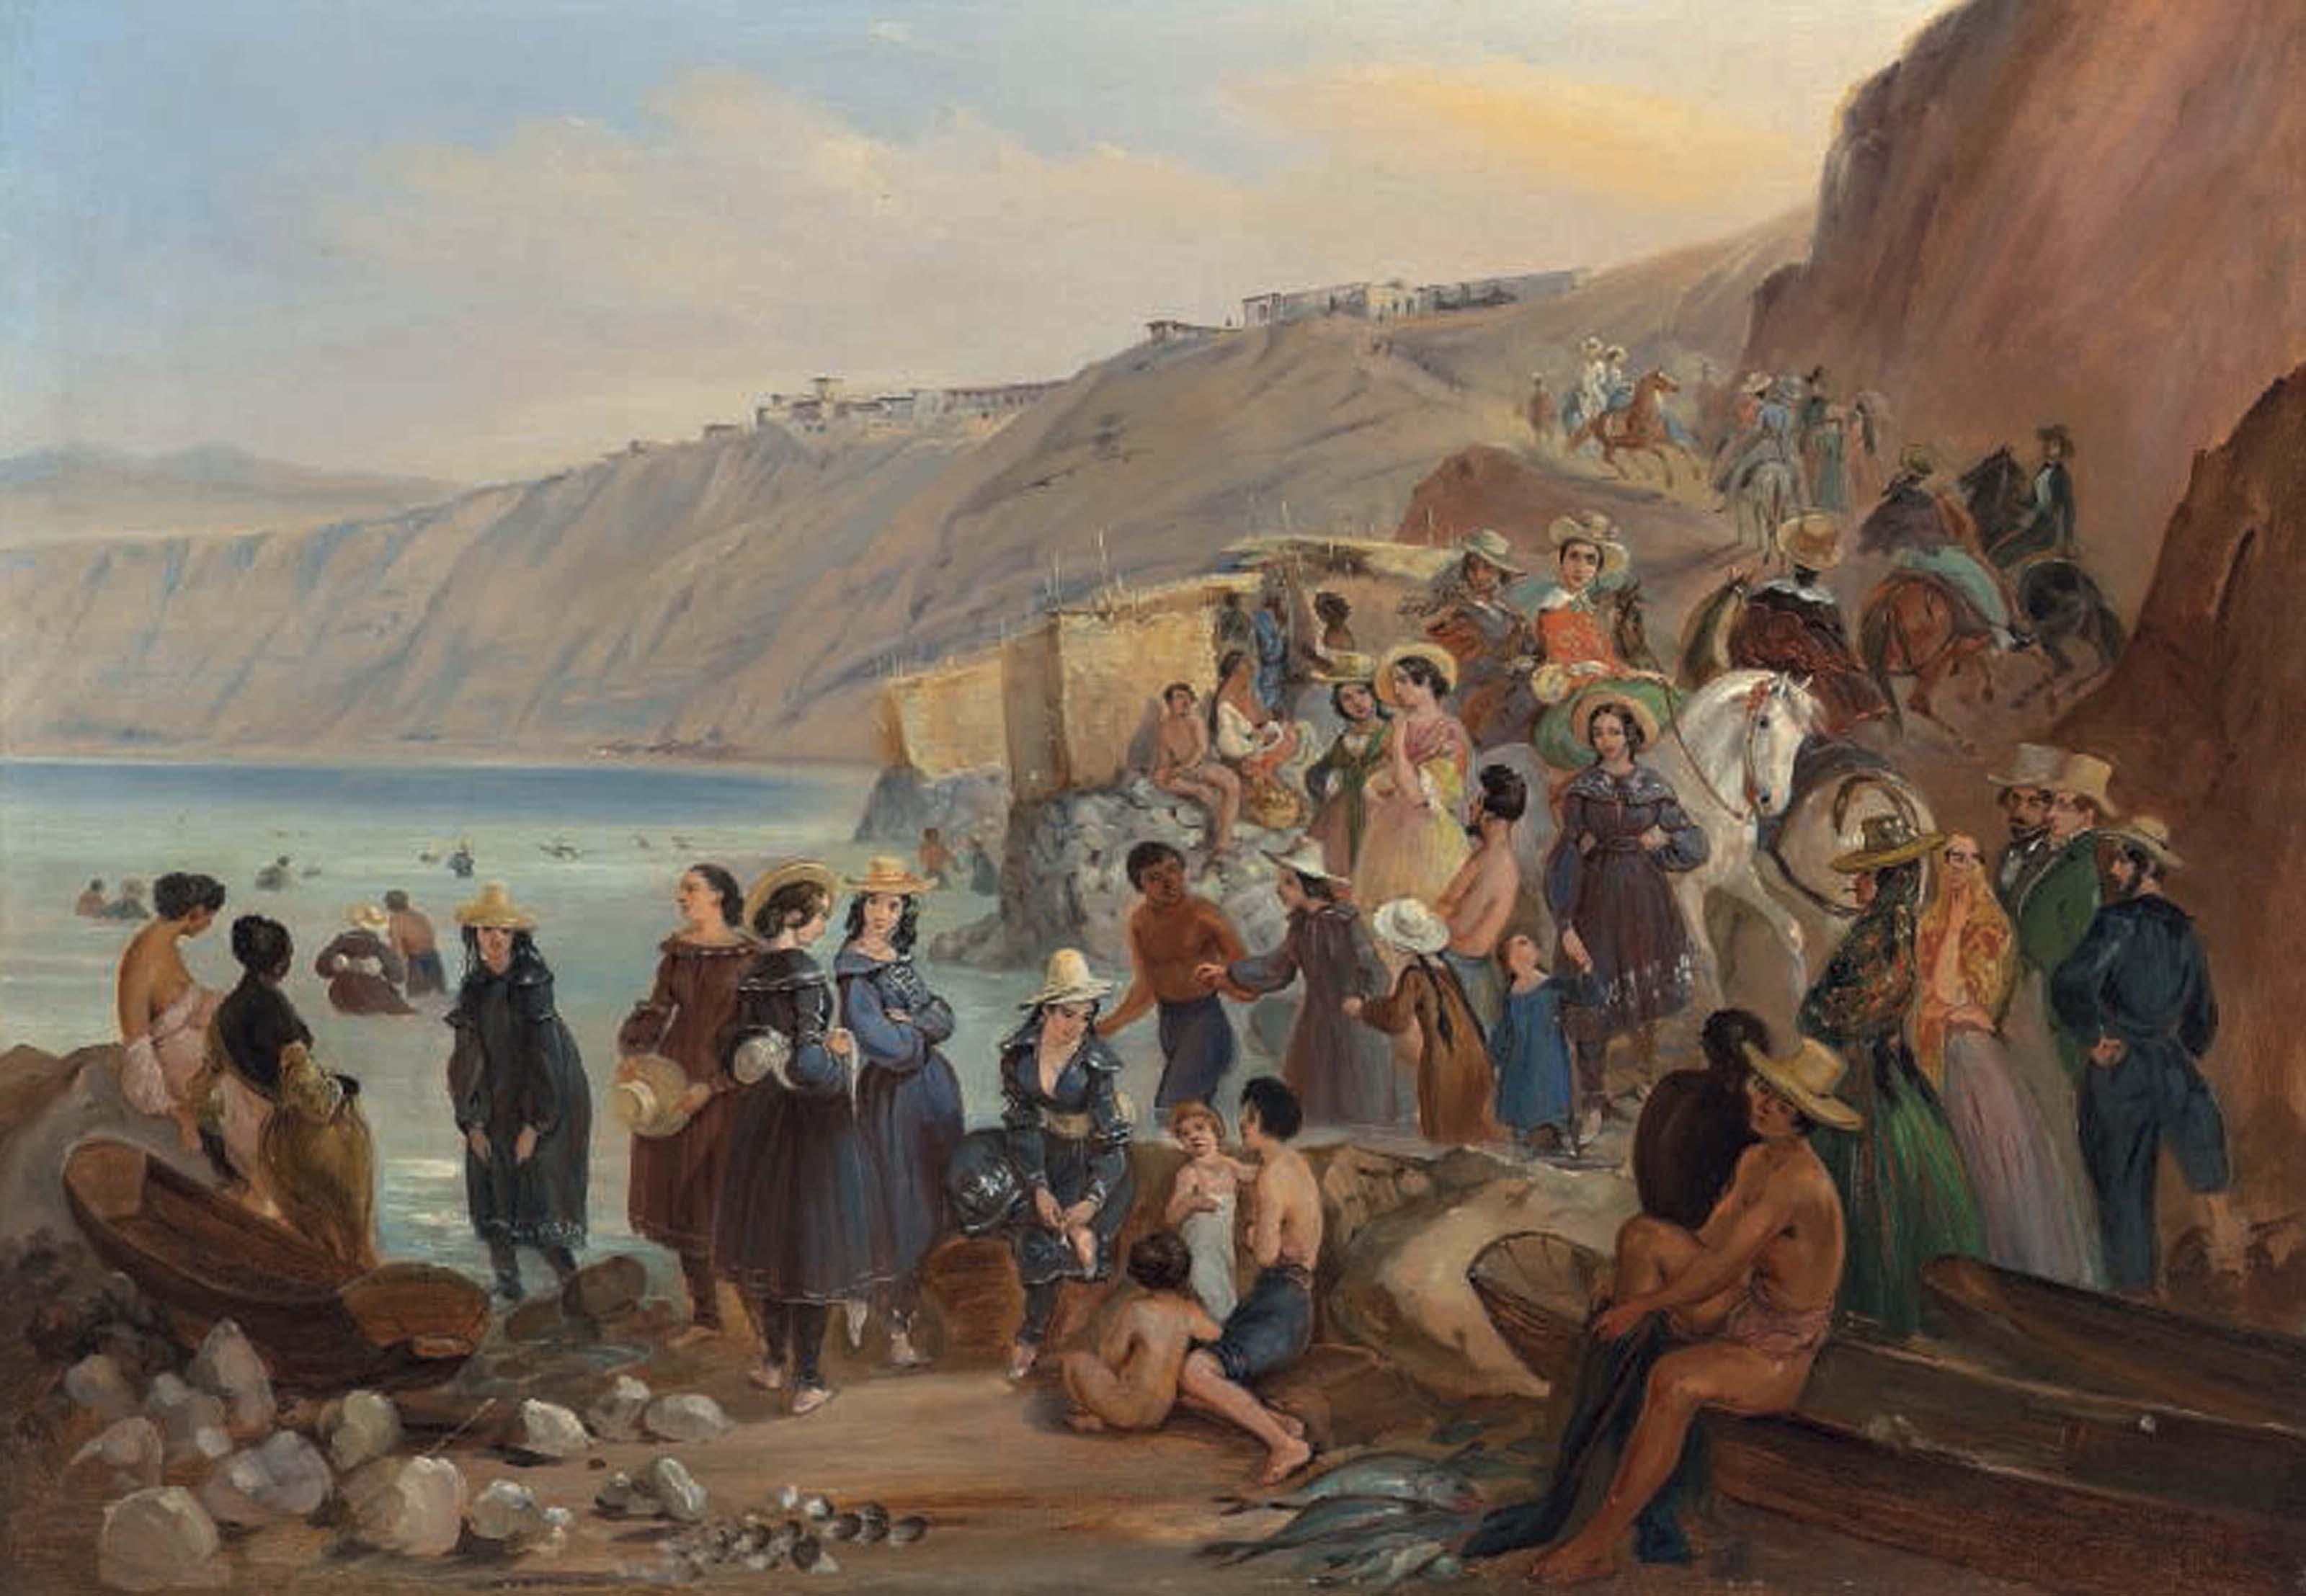 Bathers on the Chorillos beach, Miraflores, Lima